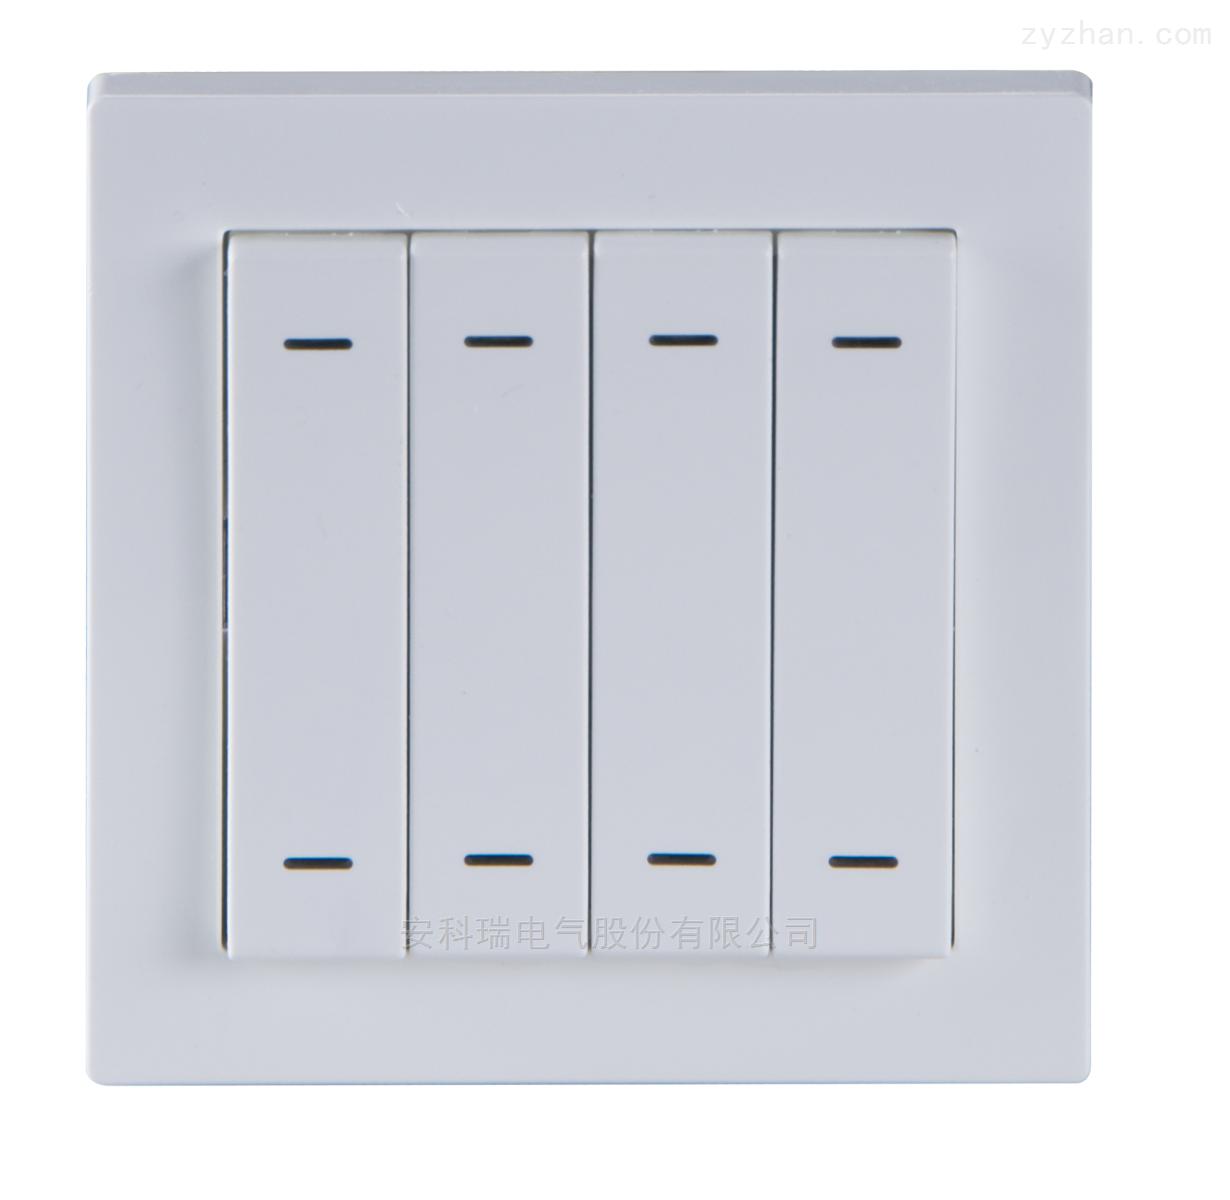 ASL100-F4/8-安科瑞智能照明控制系统智能面板 4联8键